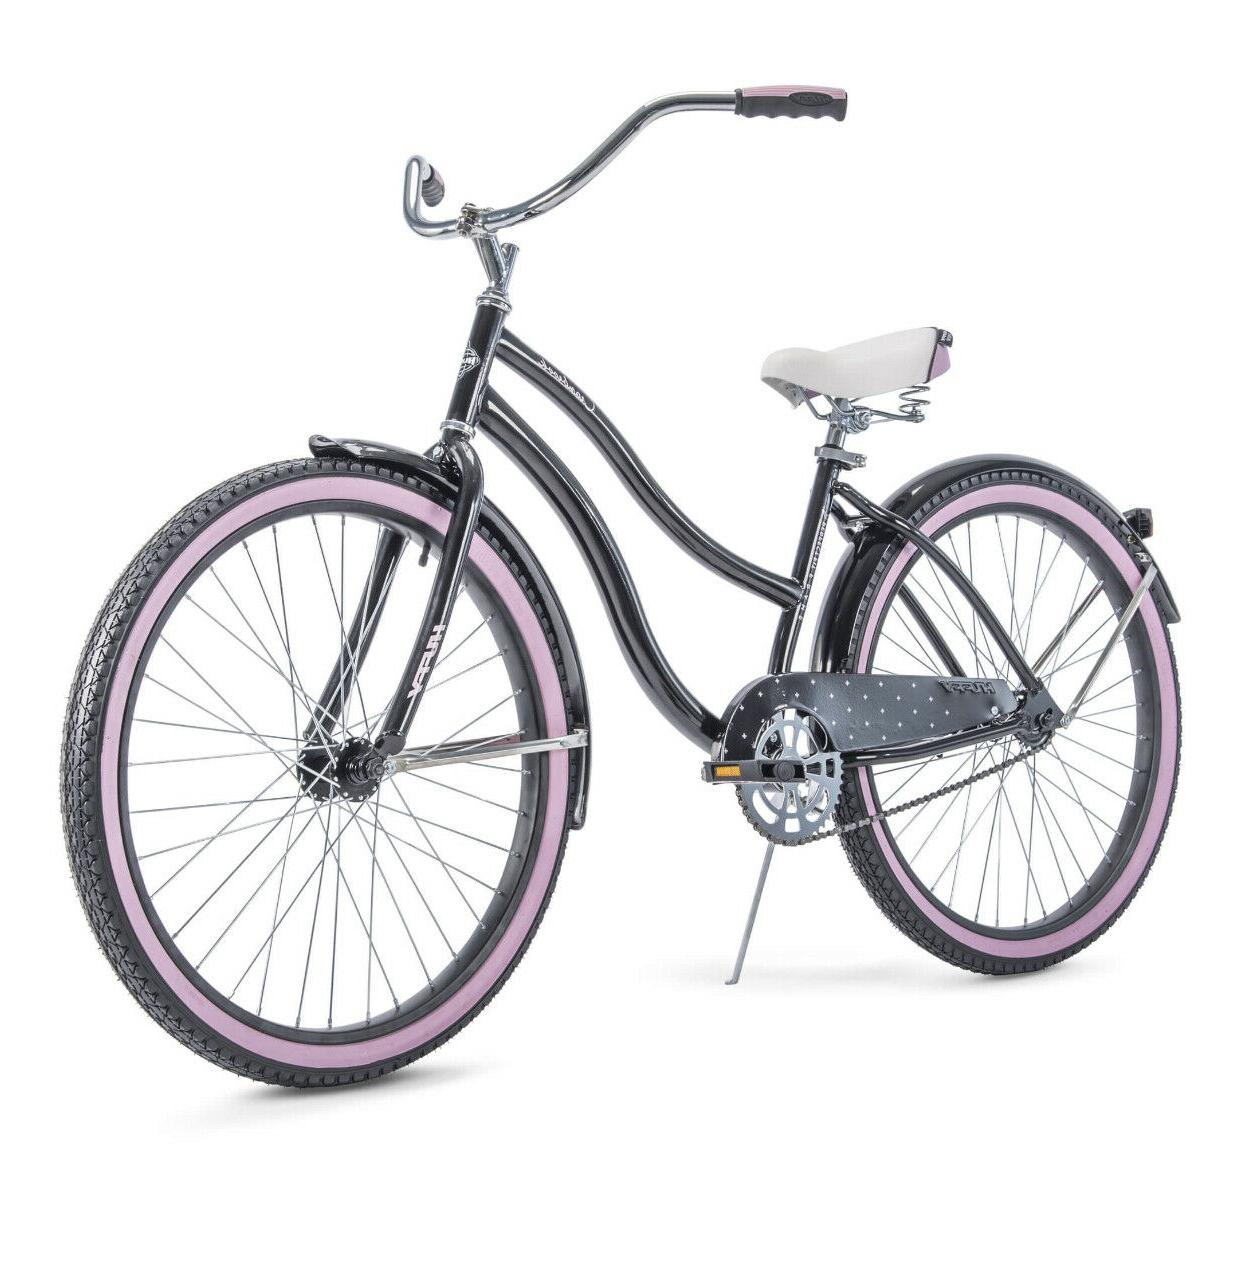 Huffy Cruiser Bike SHIPPING - AVAILABLE